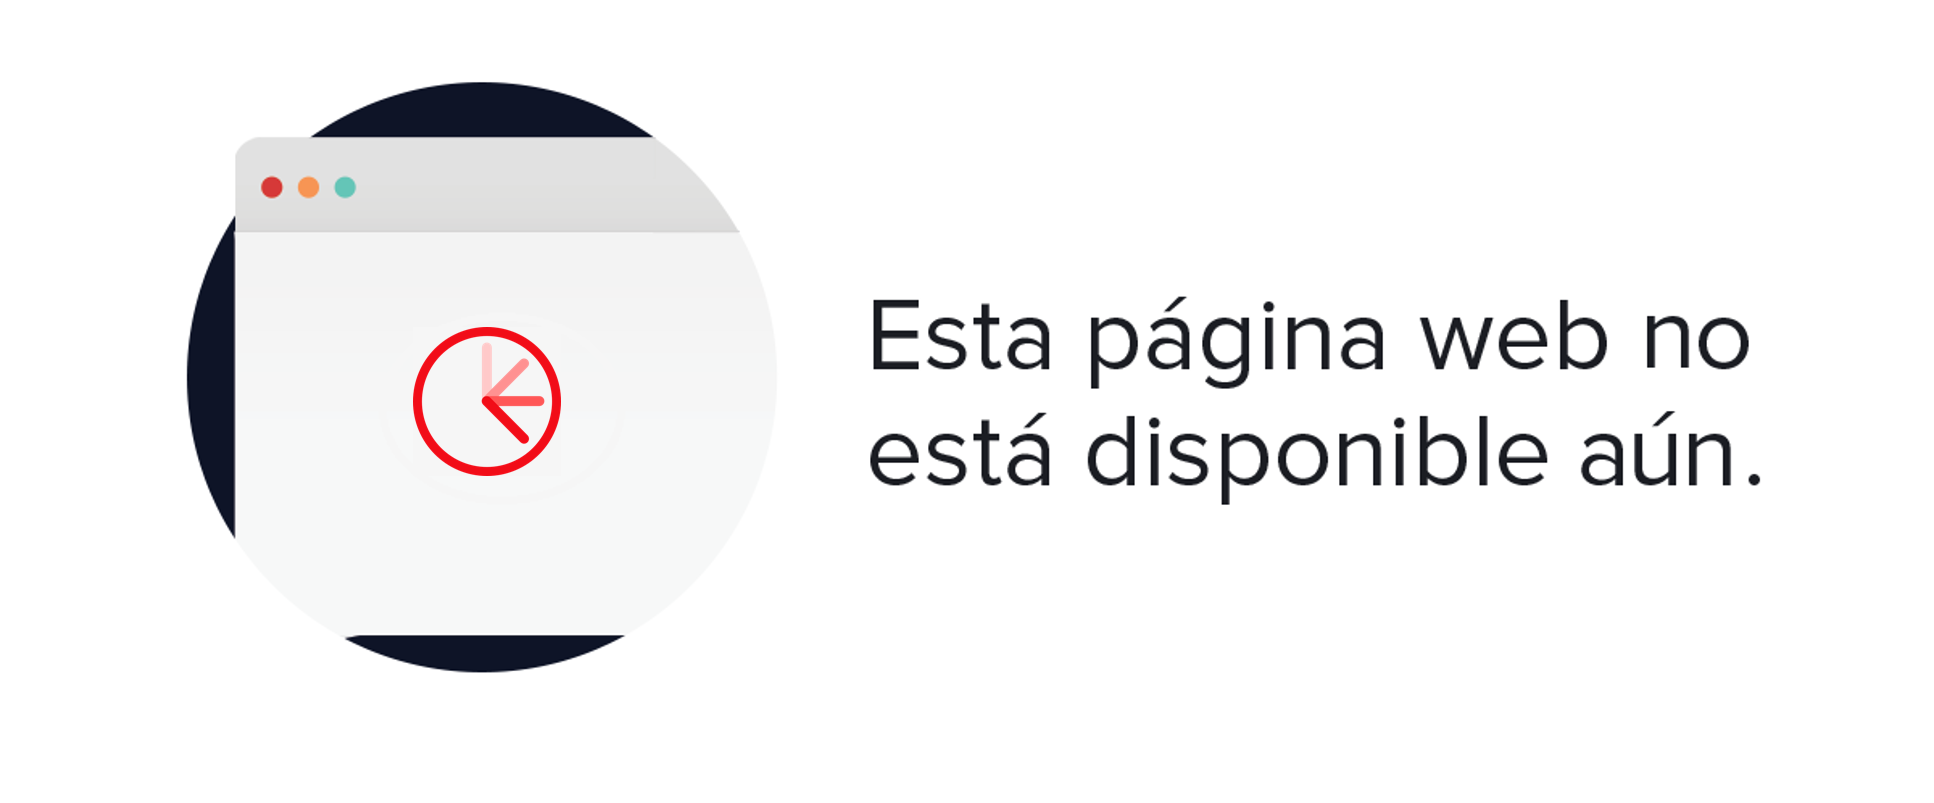 Polo Ralph Lauren - Blazer de espiga de mujer Polo Ralph Lauren en marrón Marrón 001014966294192002 - JDYDPDY